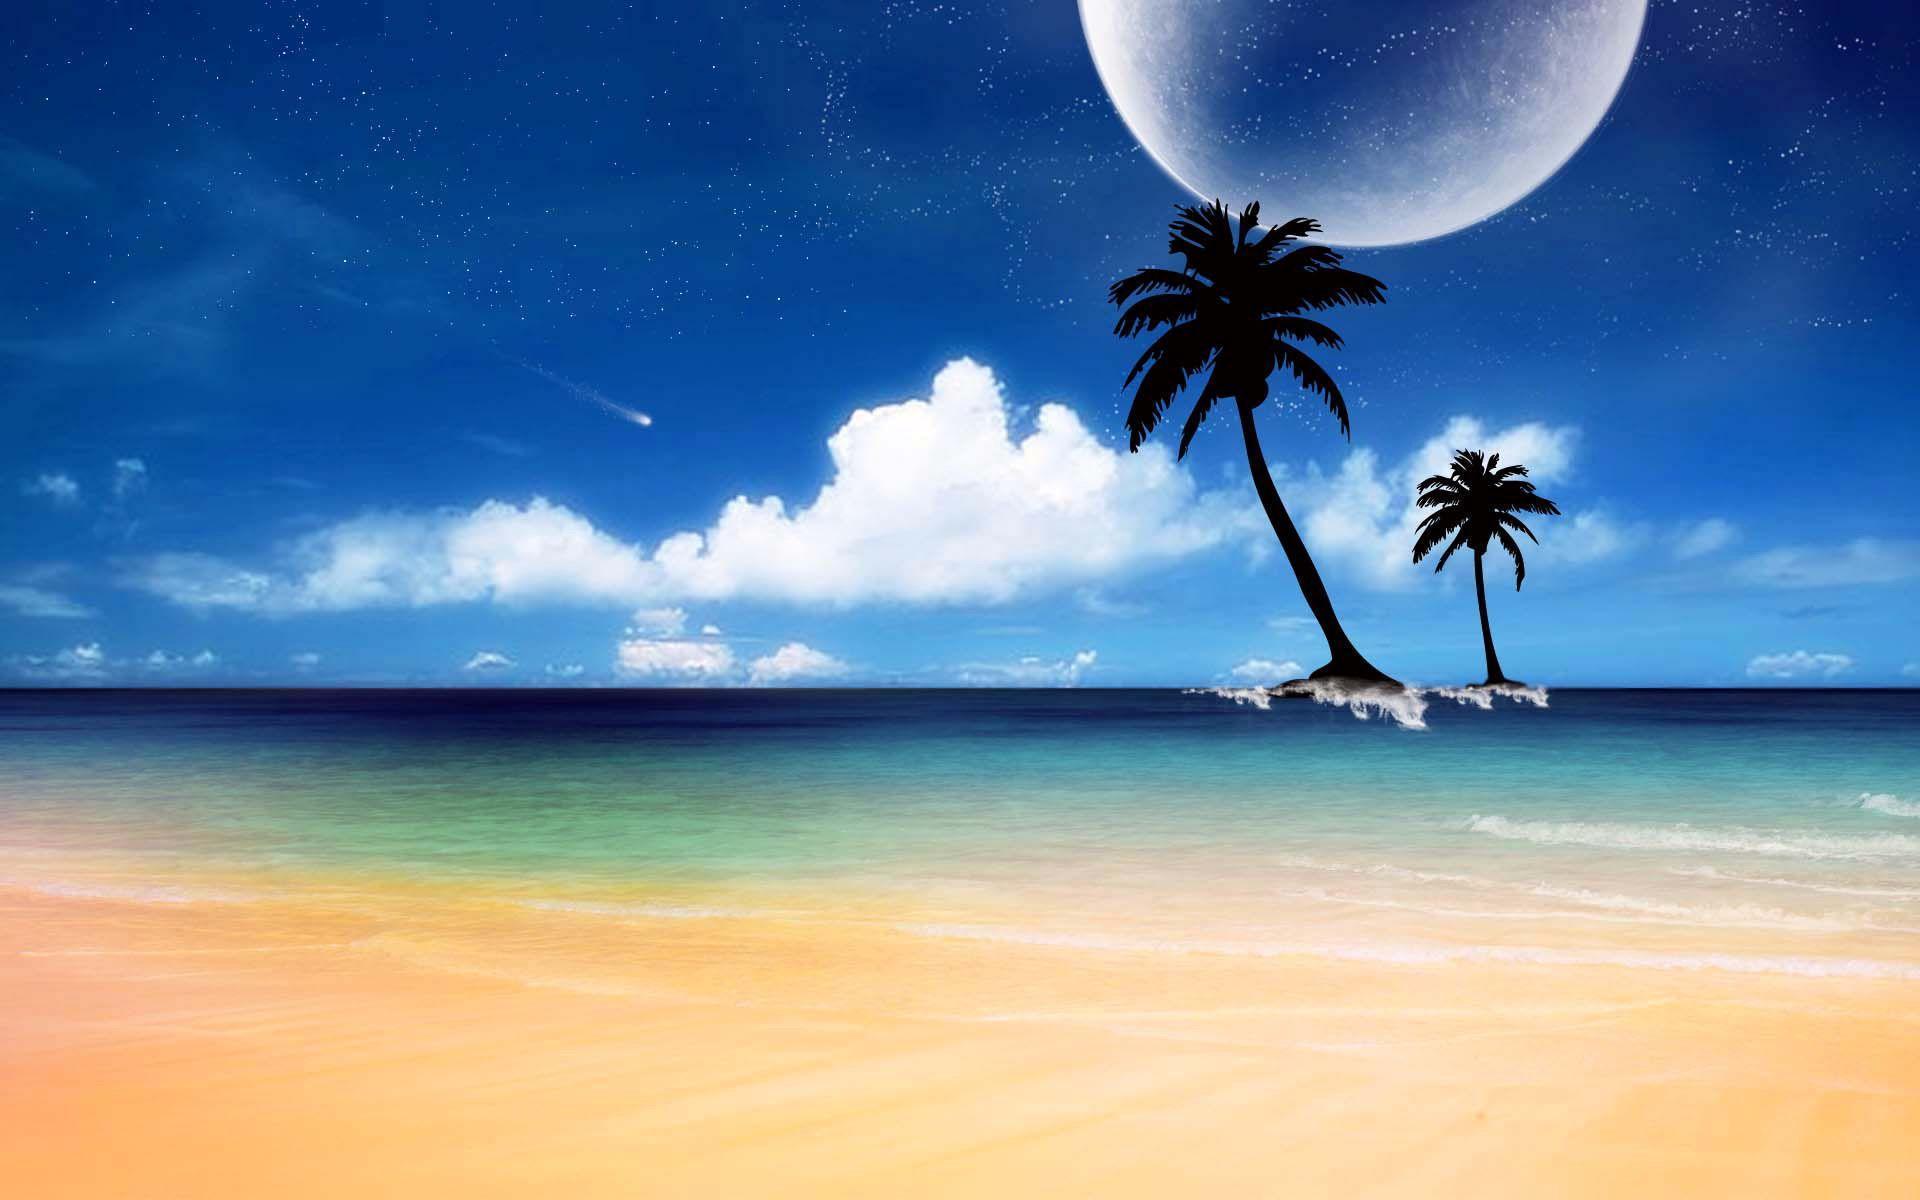 Sunny Beaches Desktop Wallpaper